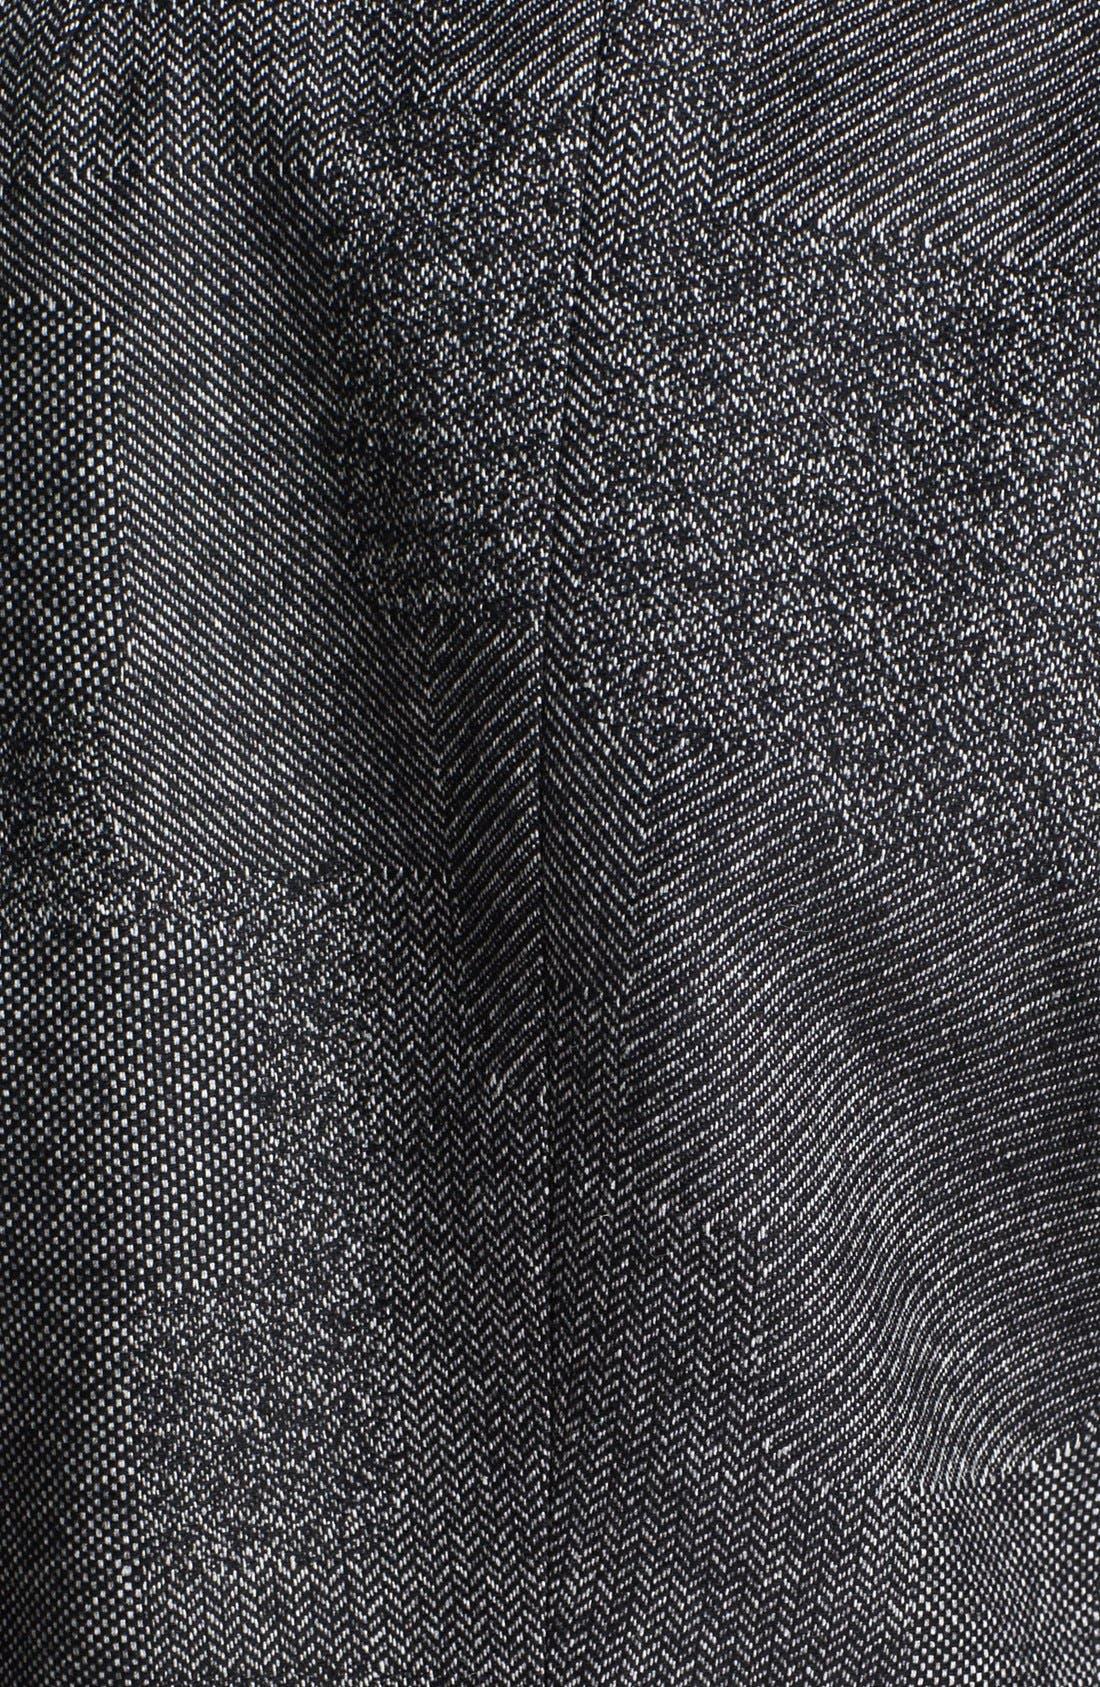 Alternate Image 3  - Trina Turk 'Slugger' Crop Jacket